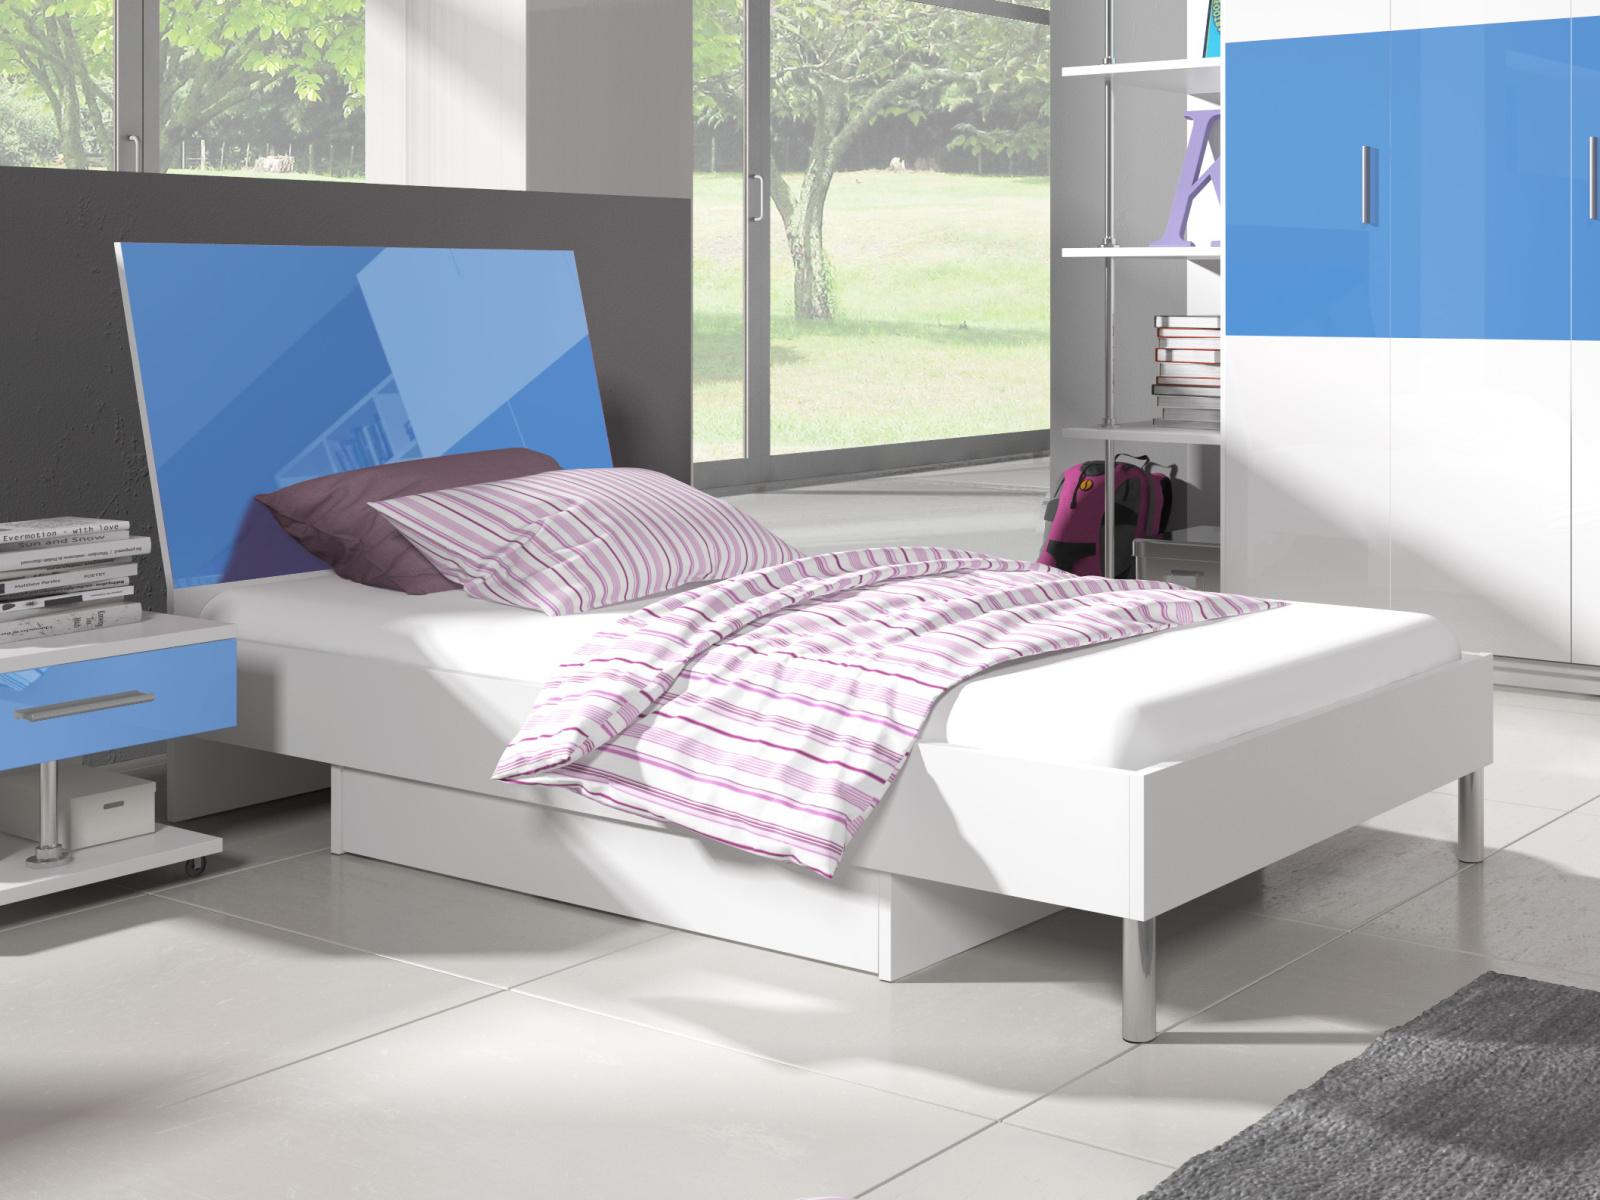 Smartshop Postel 90x200 cm RAJ 3, bílá/modrý lesk